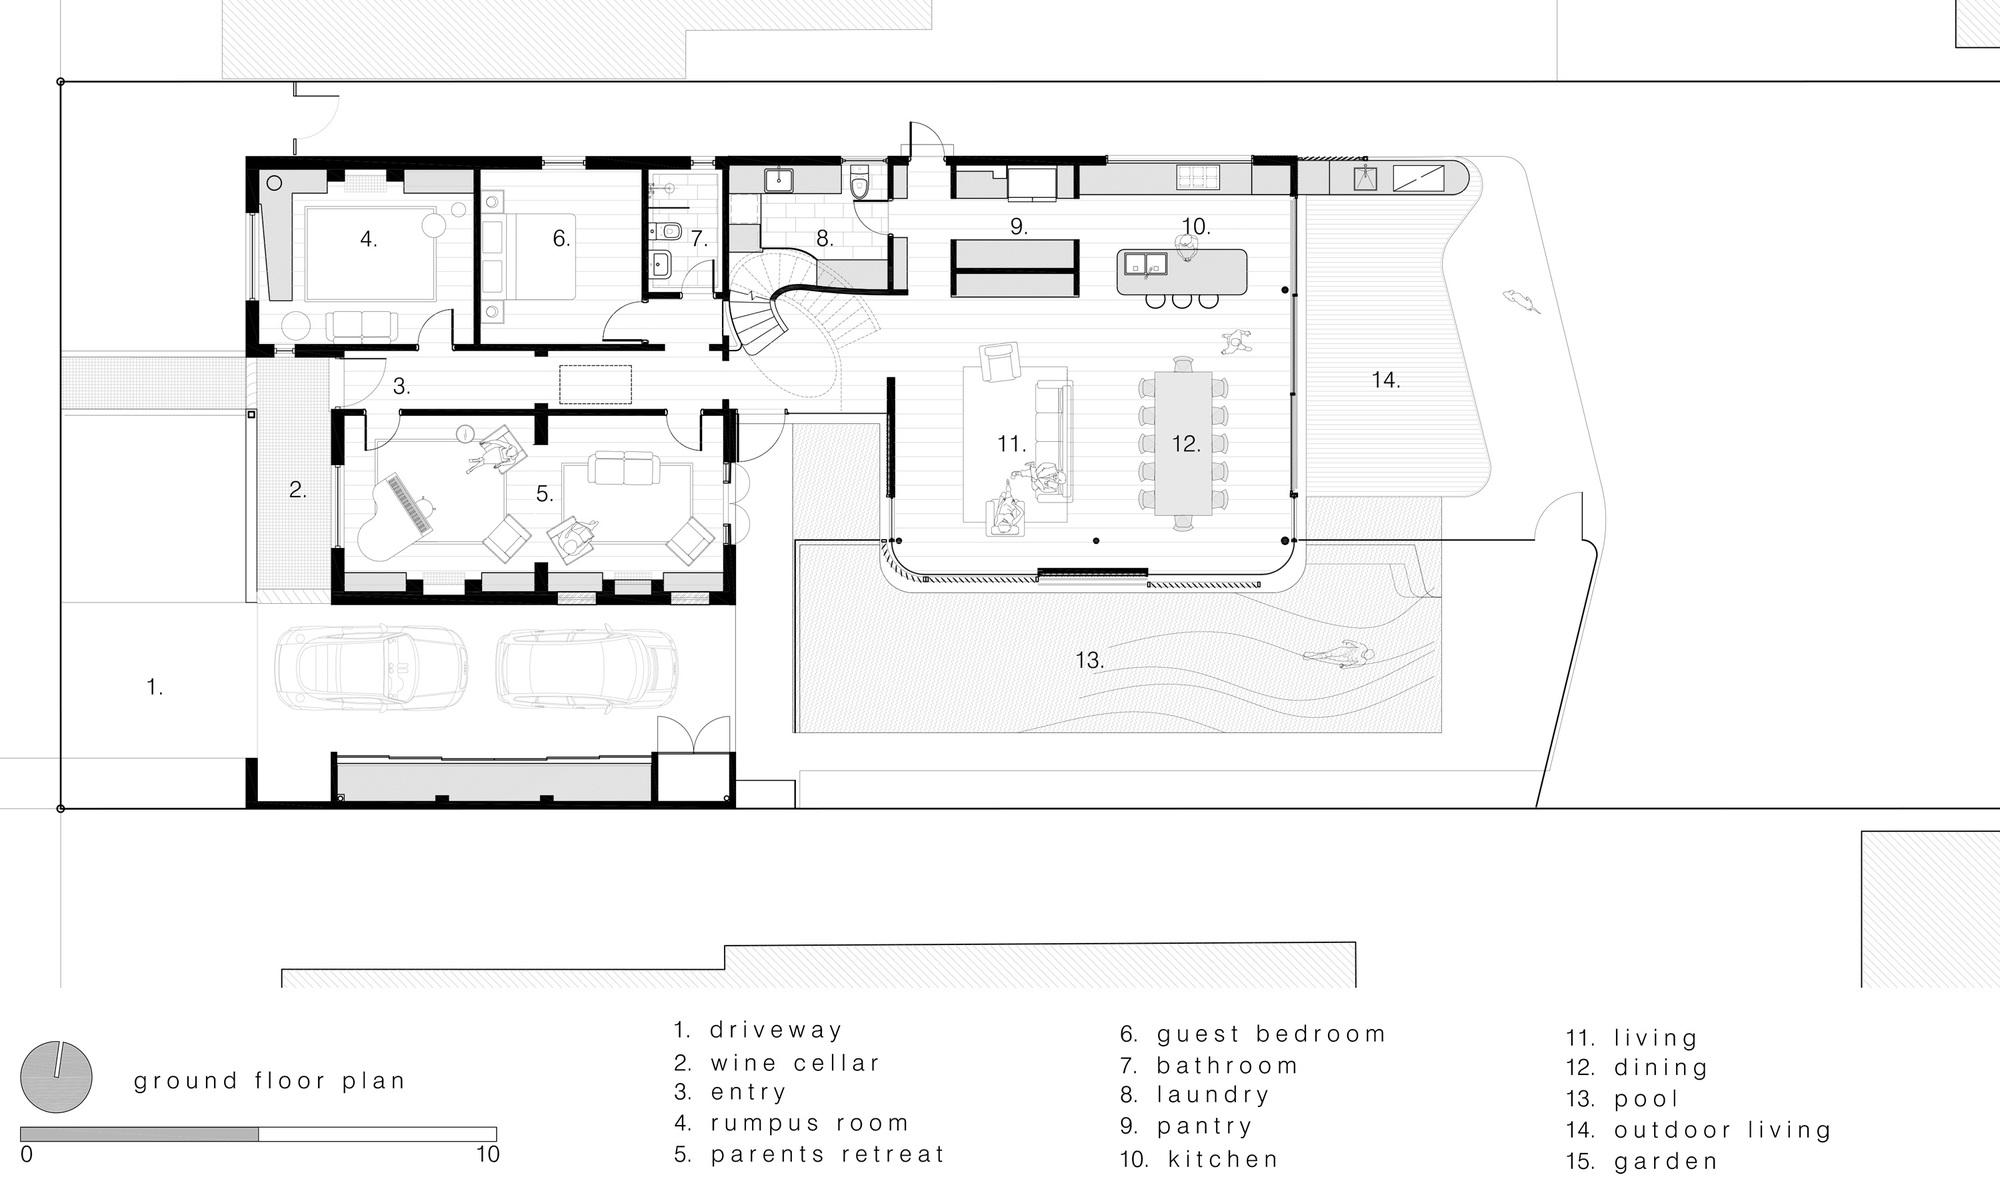 Trend Ground Floor Plan